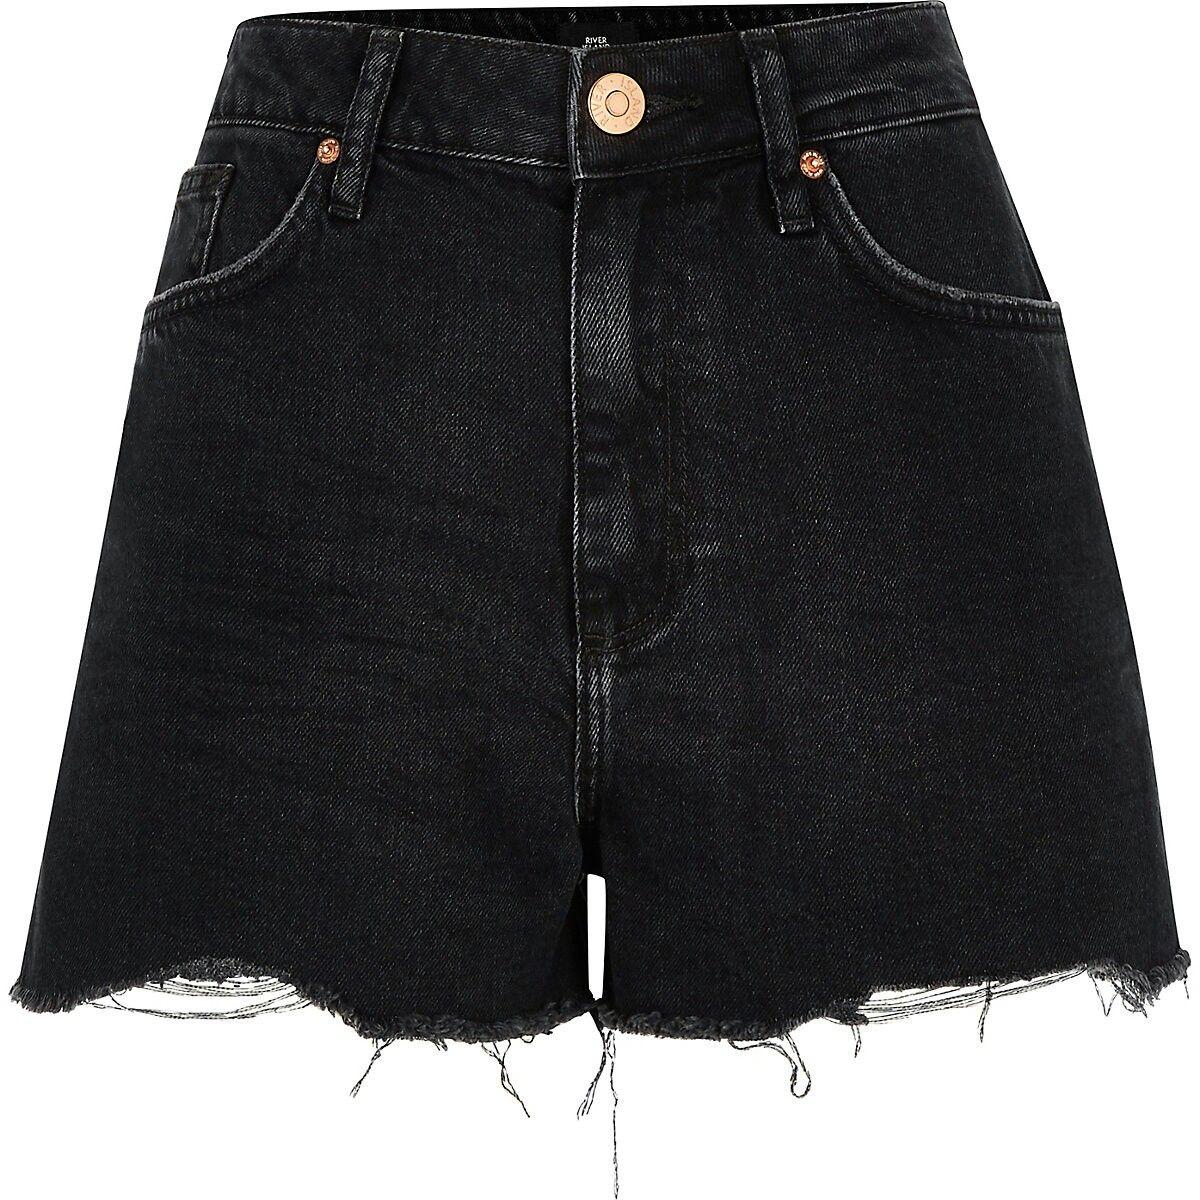 51abbd7e878 Black Annie washed high waist denim shorts | RI Denim Shorts in 2019 ...